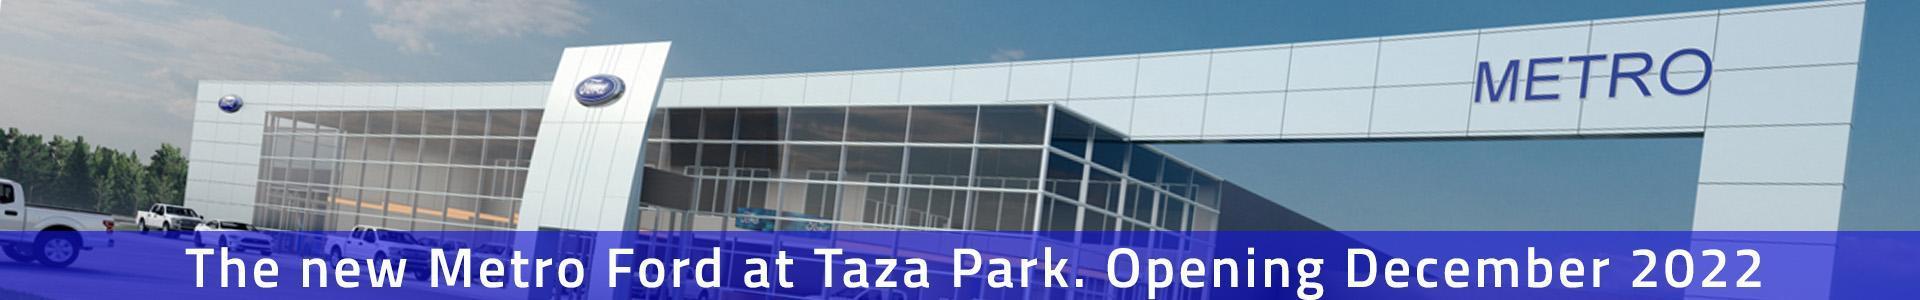 The new Metro Ford at Taza Park